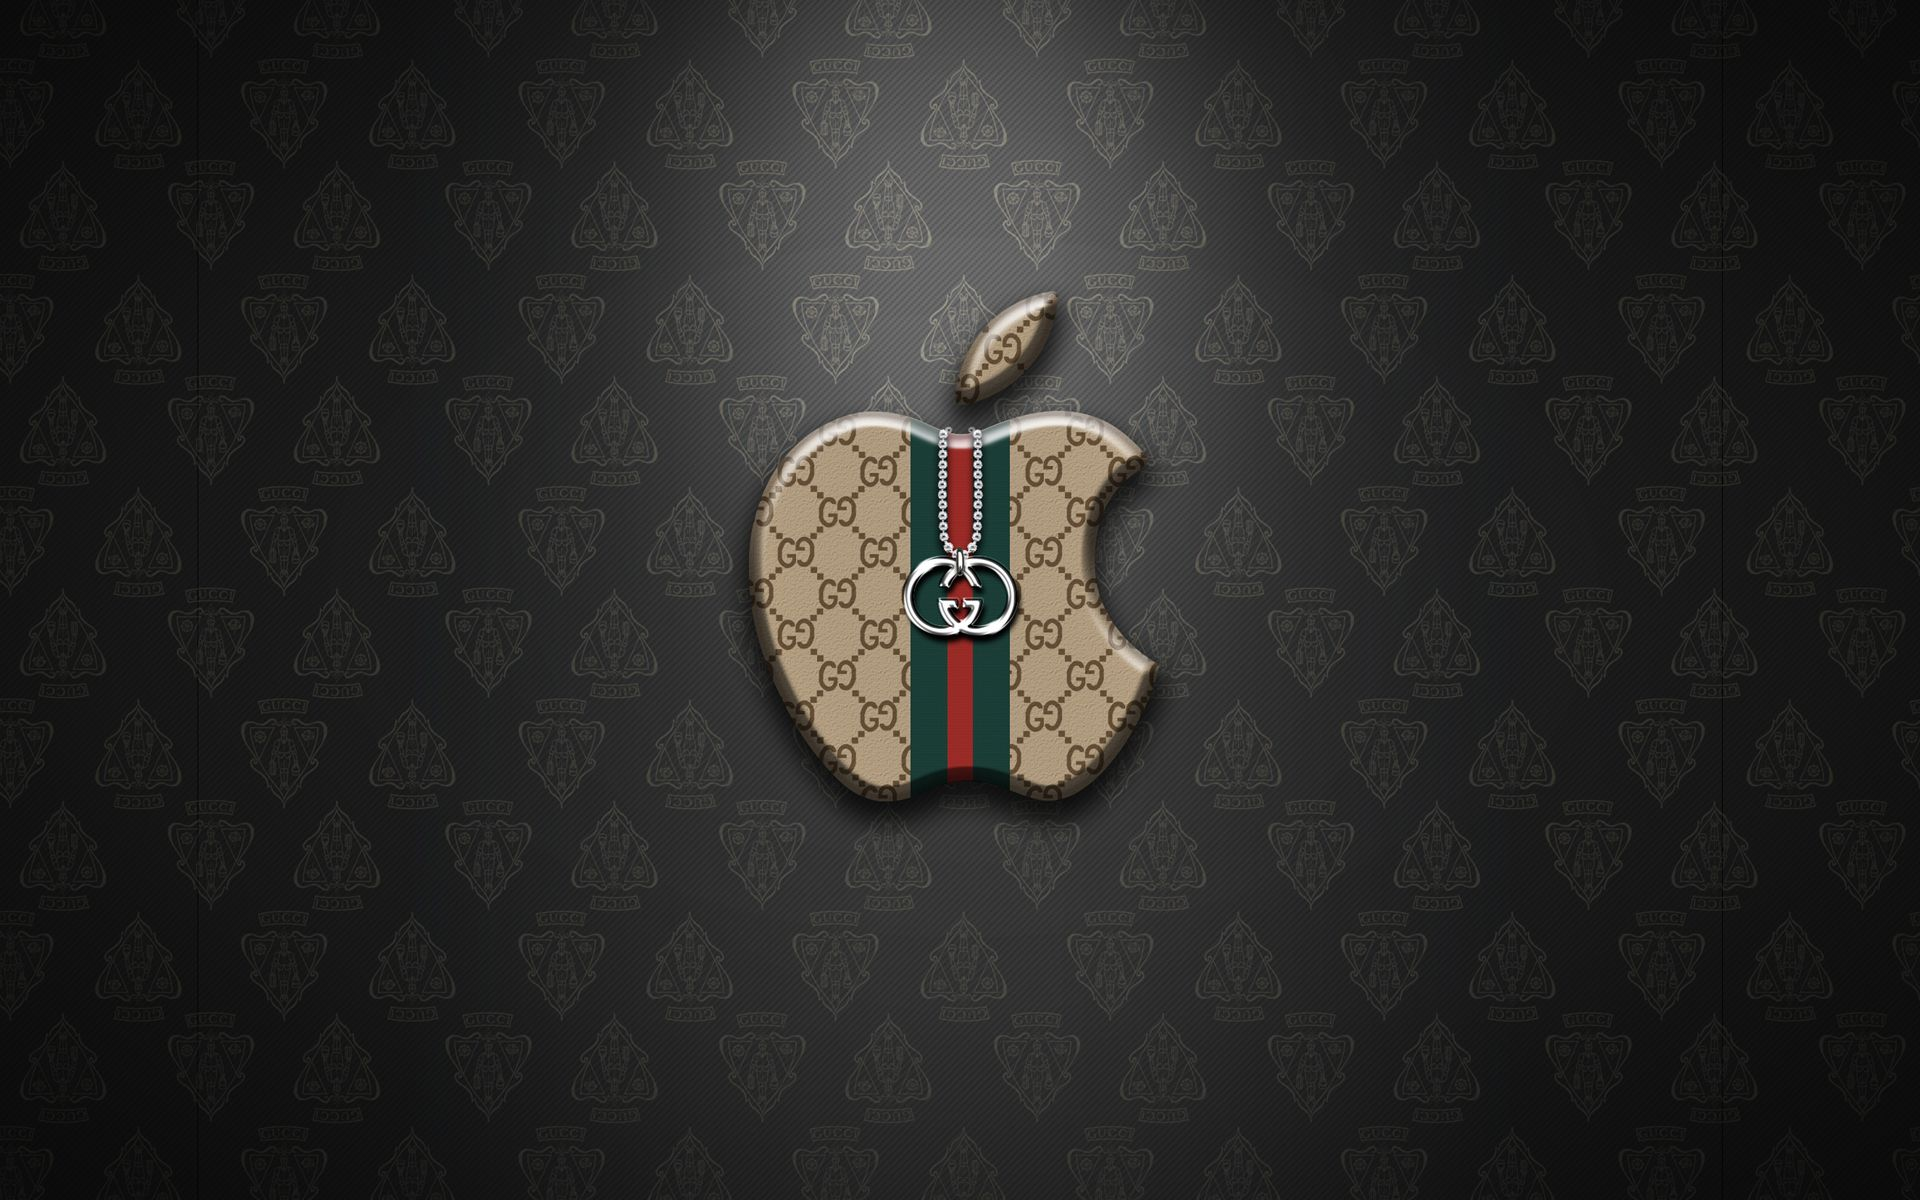 Gucci Wallpaper Logo Wallpaper Hd Gucci Wallpaper Iphone Apple Wallpaper